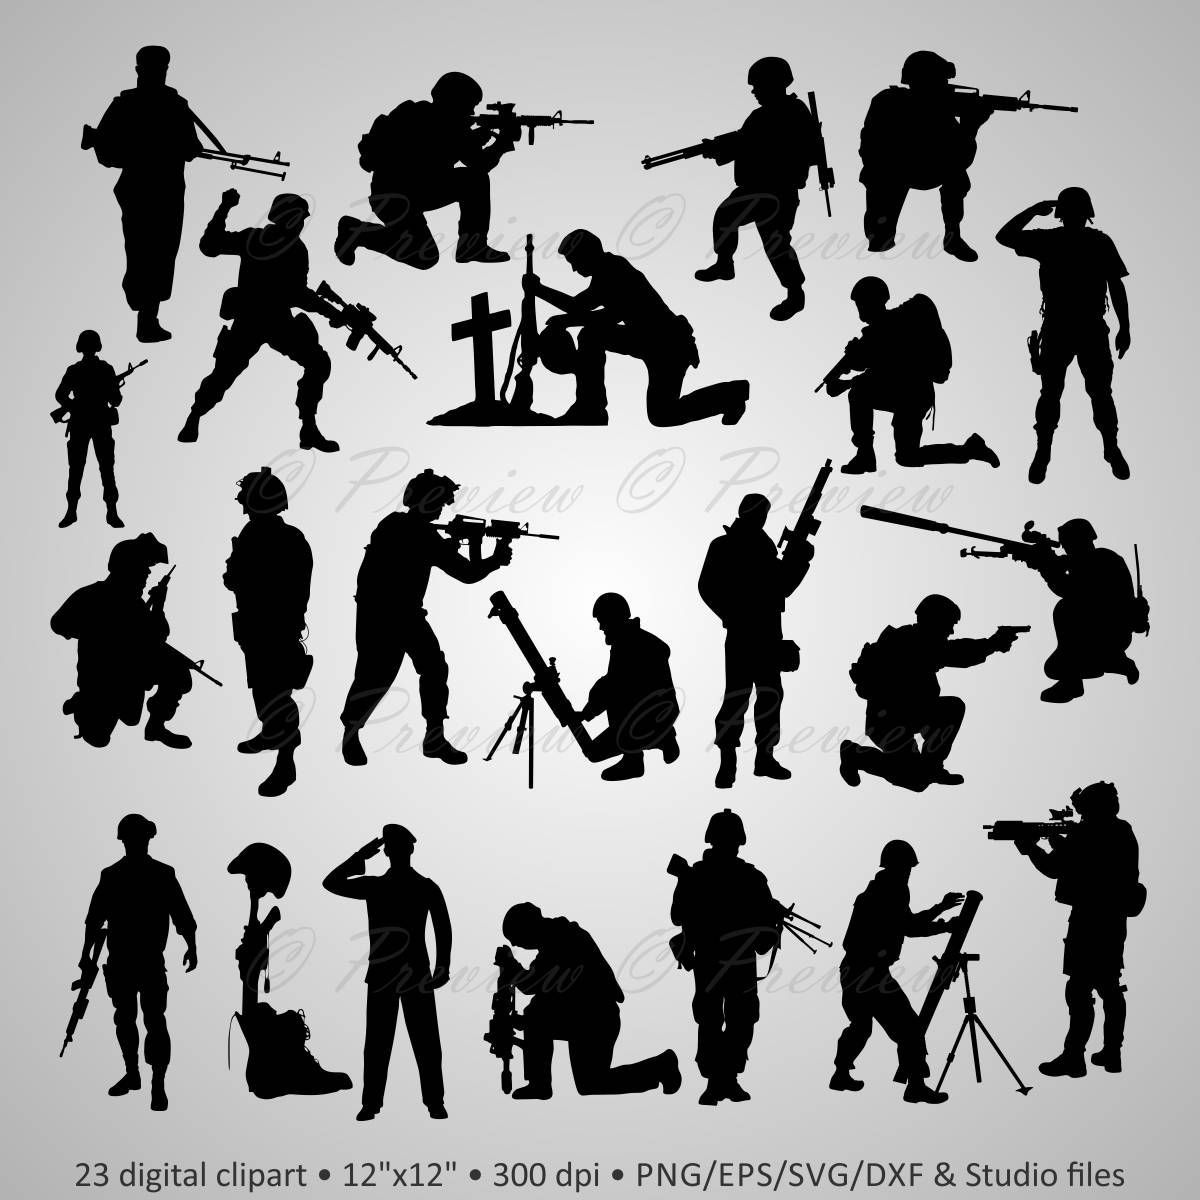 Buy 2 Get 1 Free Digital Clipart Silhouettes Soldier Army Etsy Soldier Silhouette Digital Clip Art Military Tattoos [ 1200 x 1200 Pixel ]